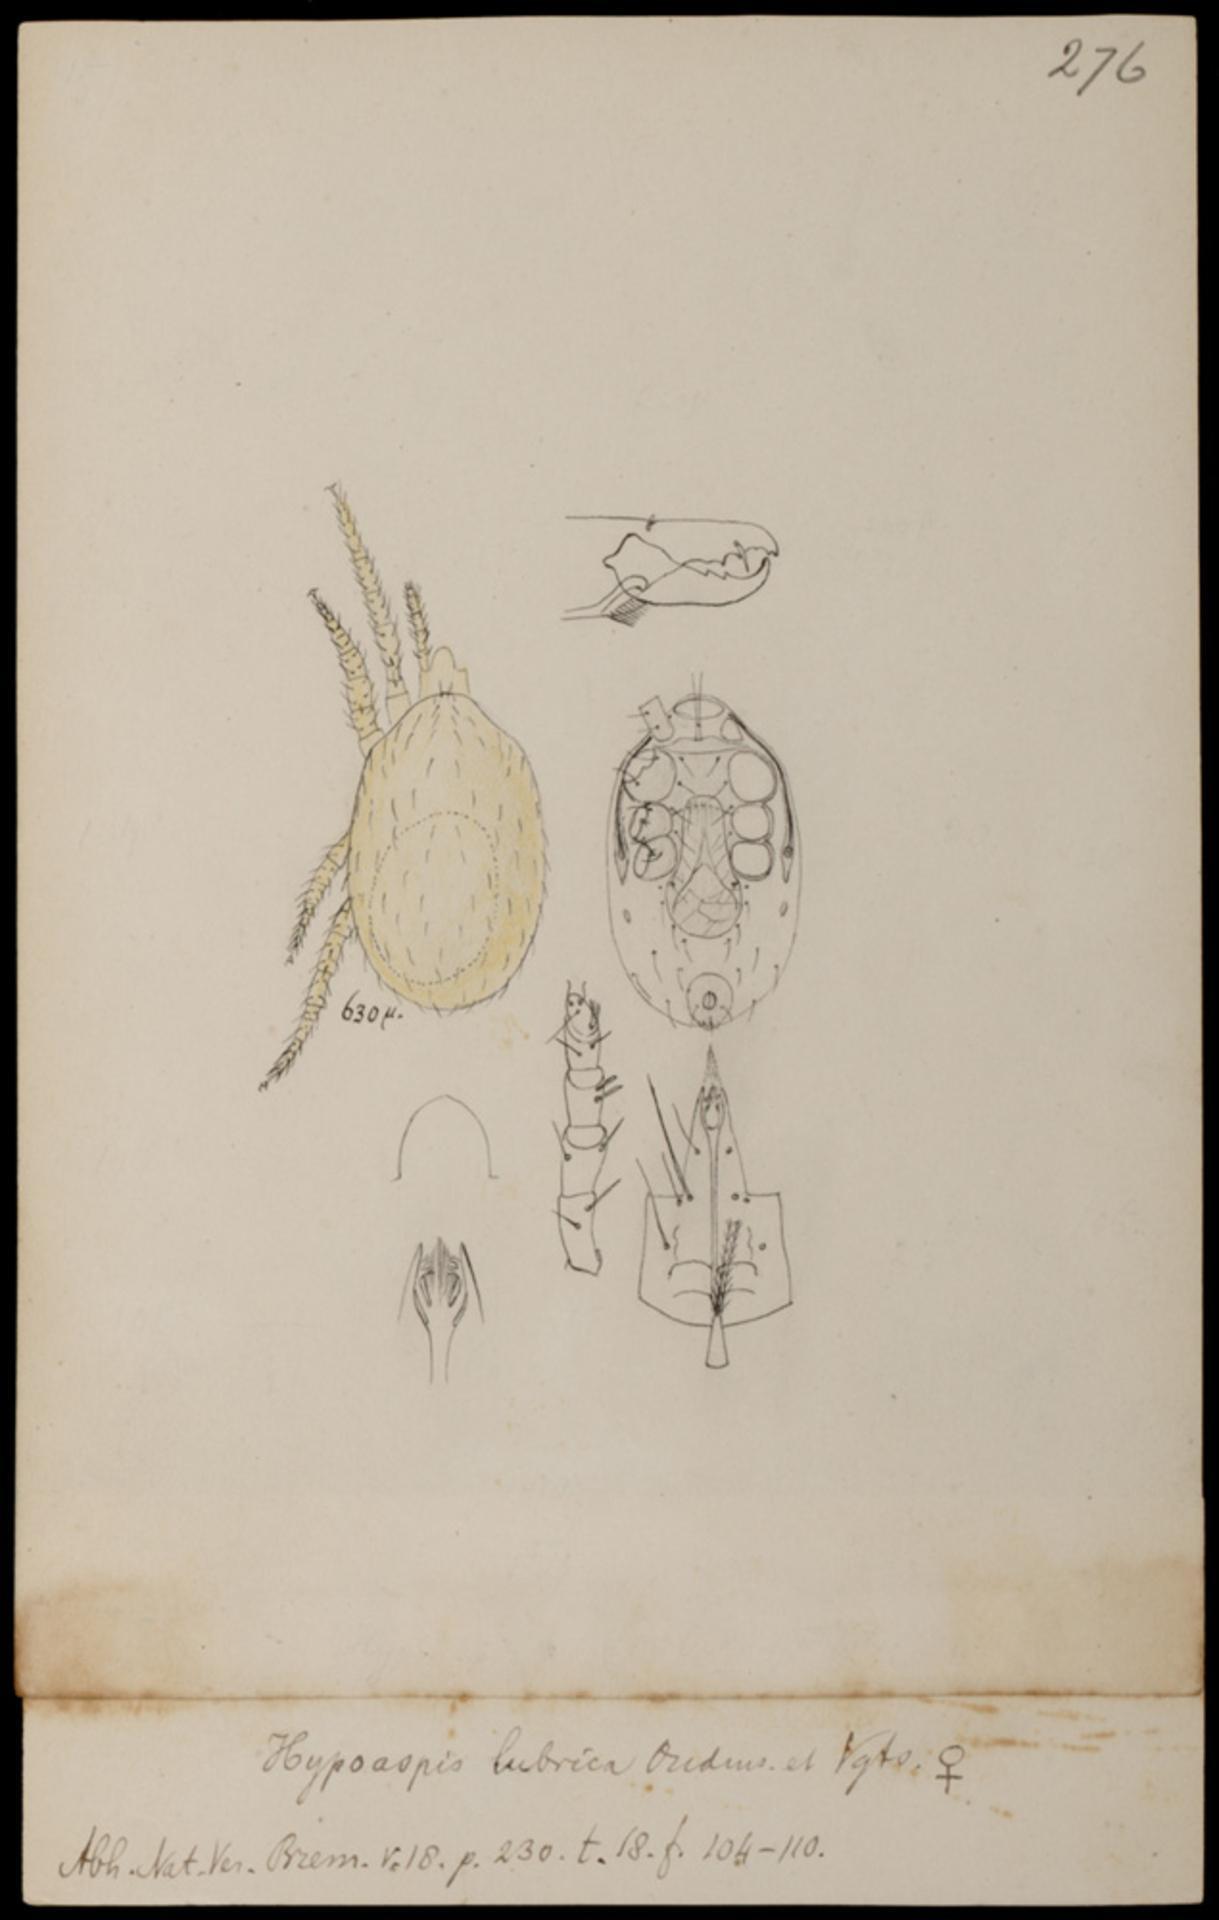 Image of Hypoaspis